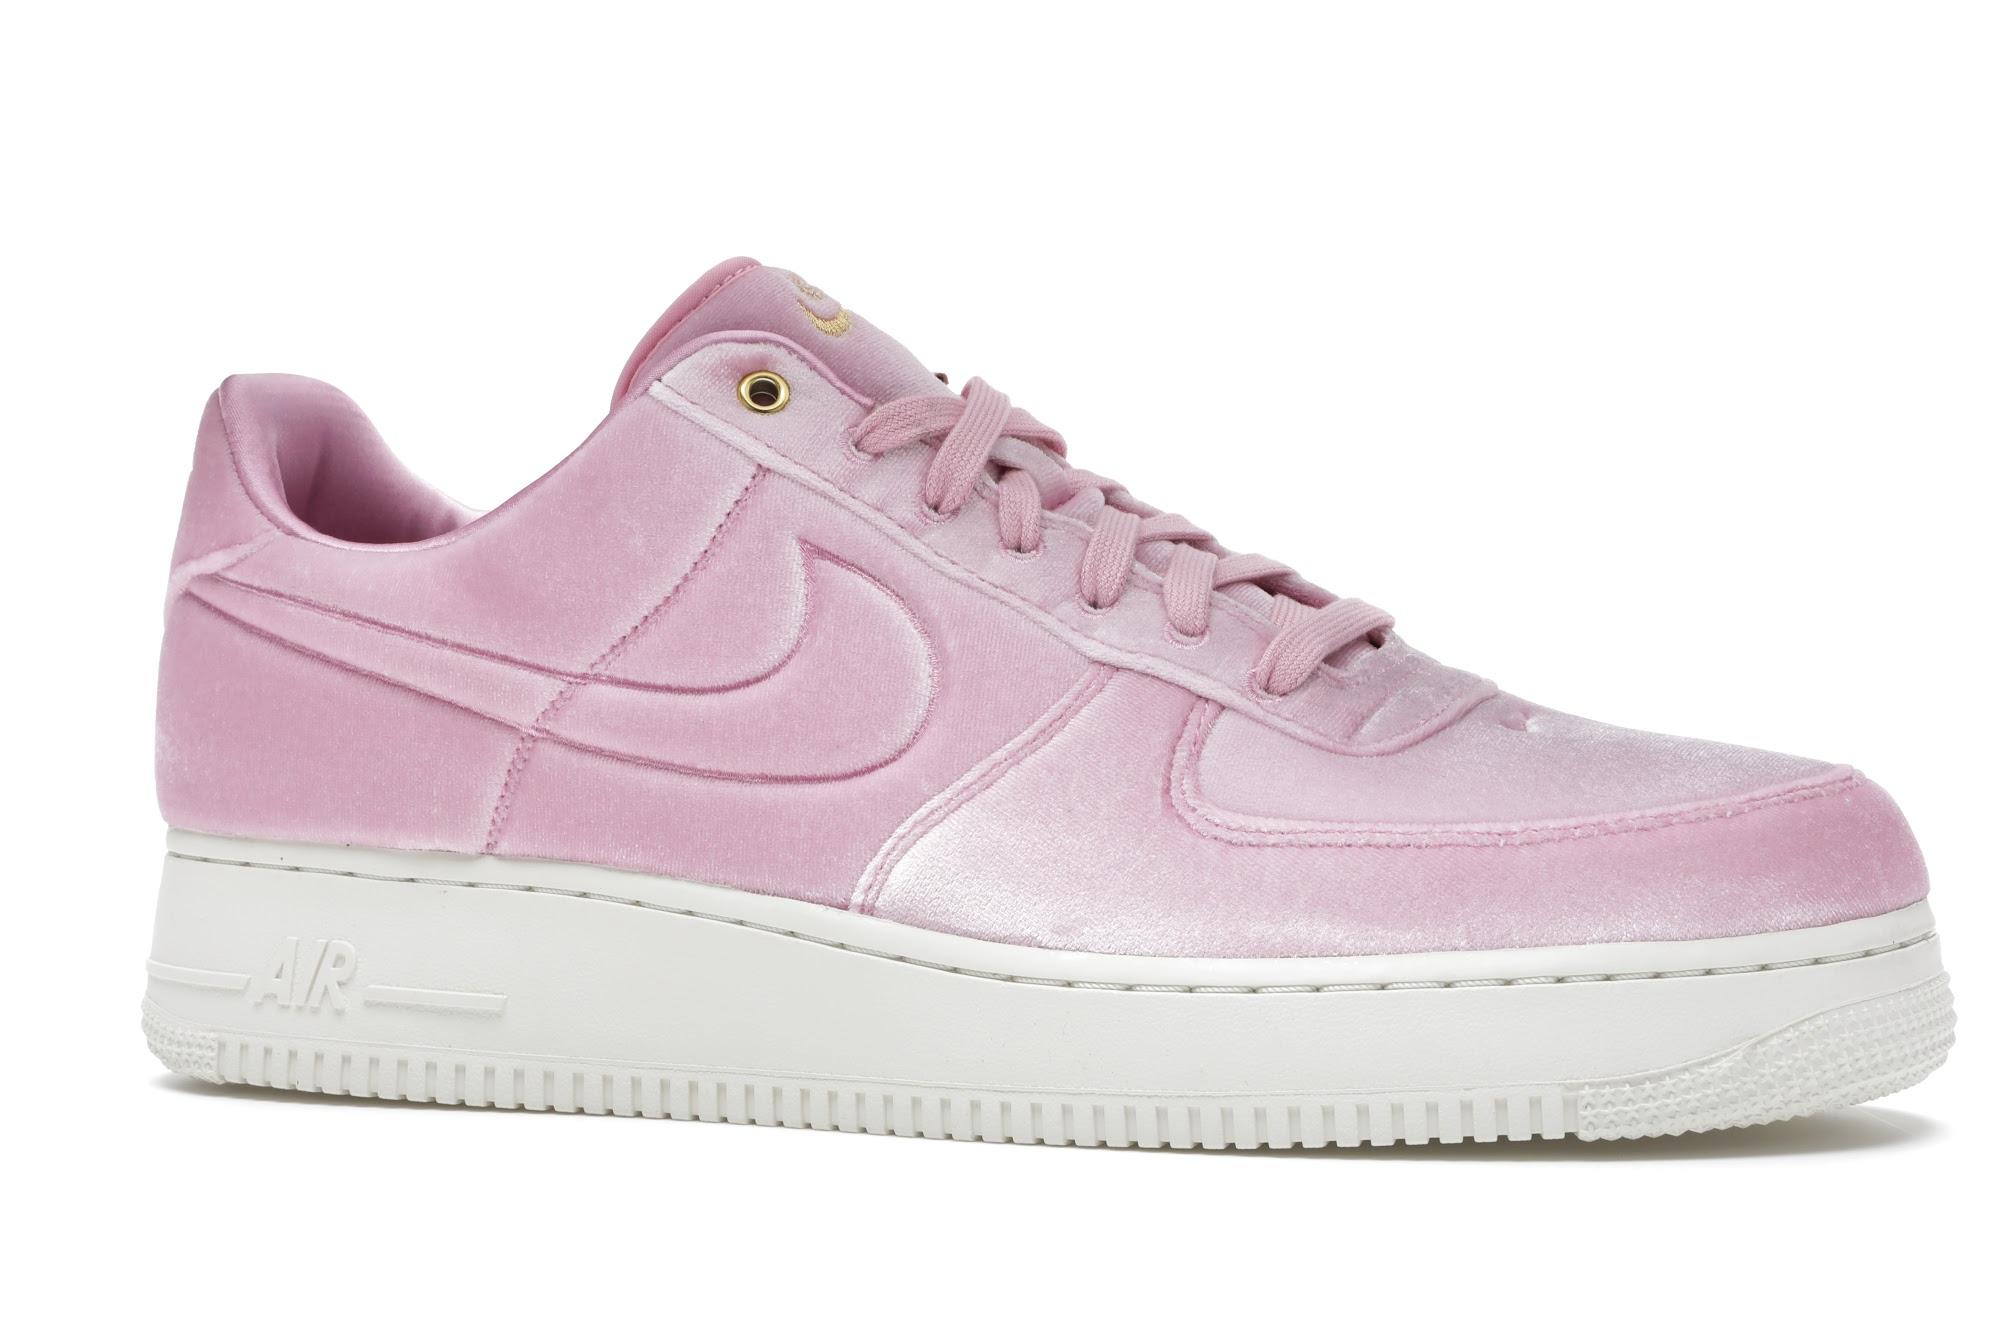 Nike Air Force 1 Low Premium 3 Velour Pink Rise